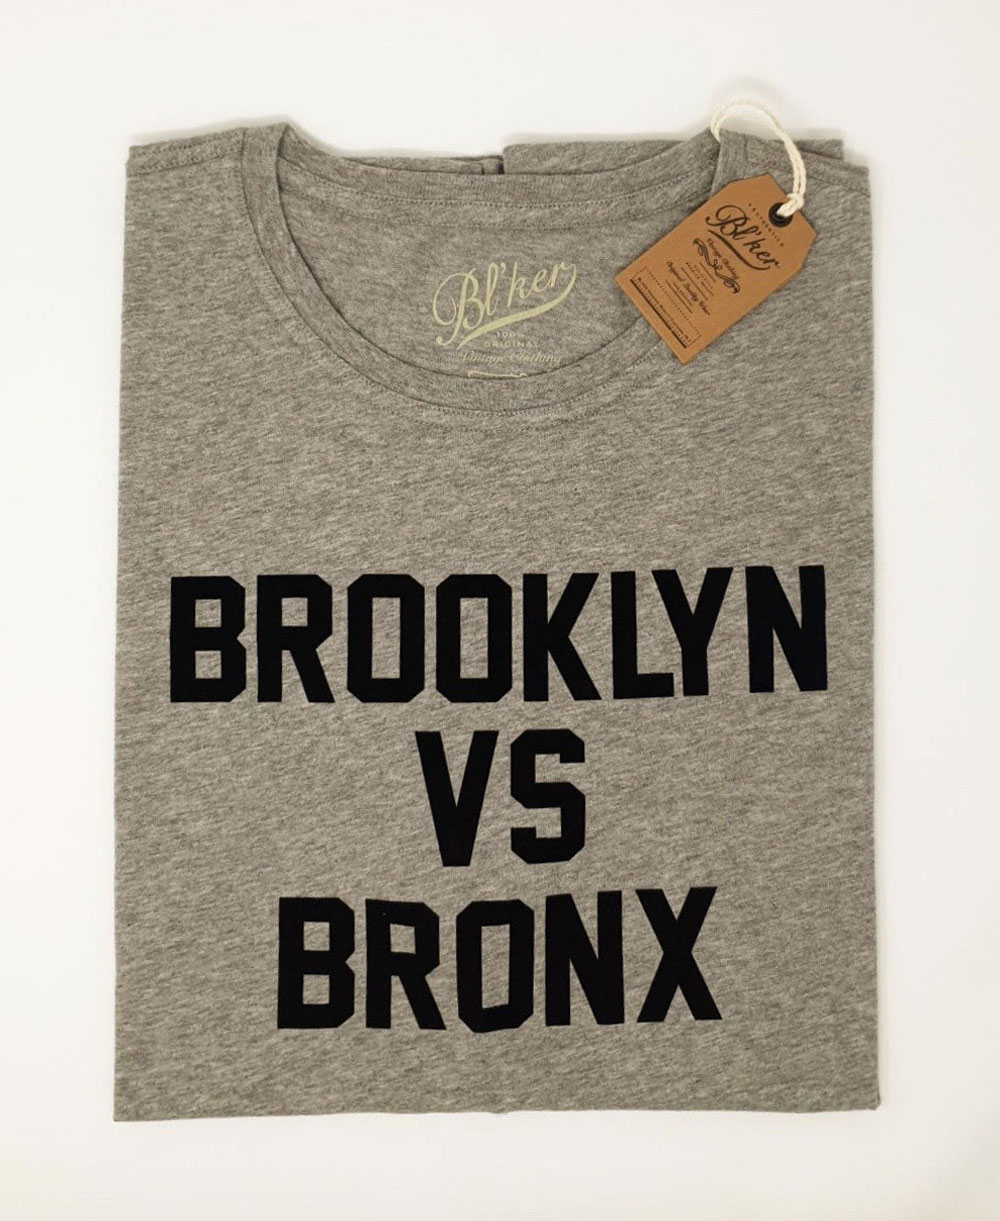 Brkln Vs Bronx T-Shirt Manica Corta Uomo Heather Grey